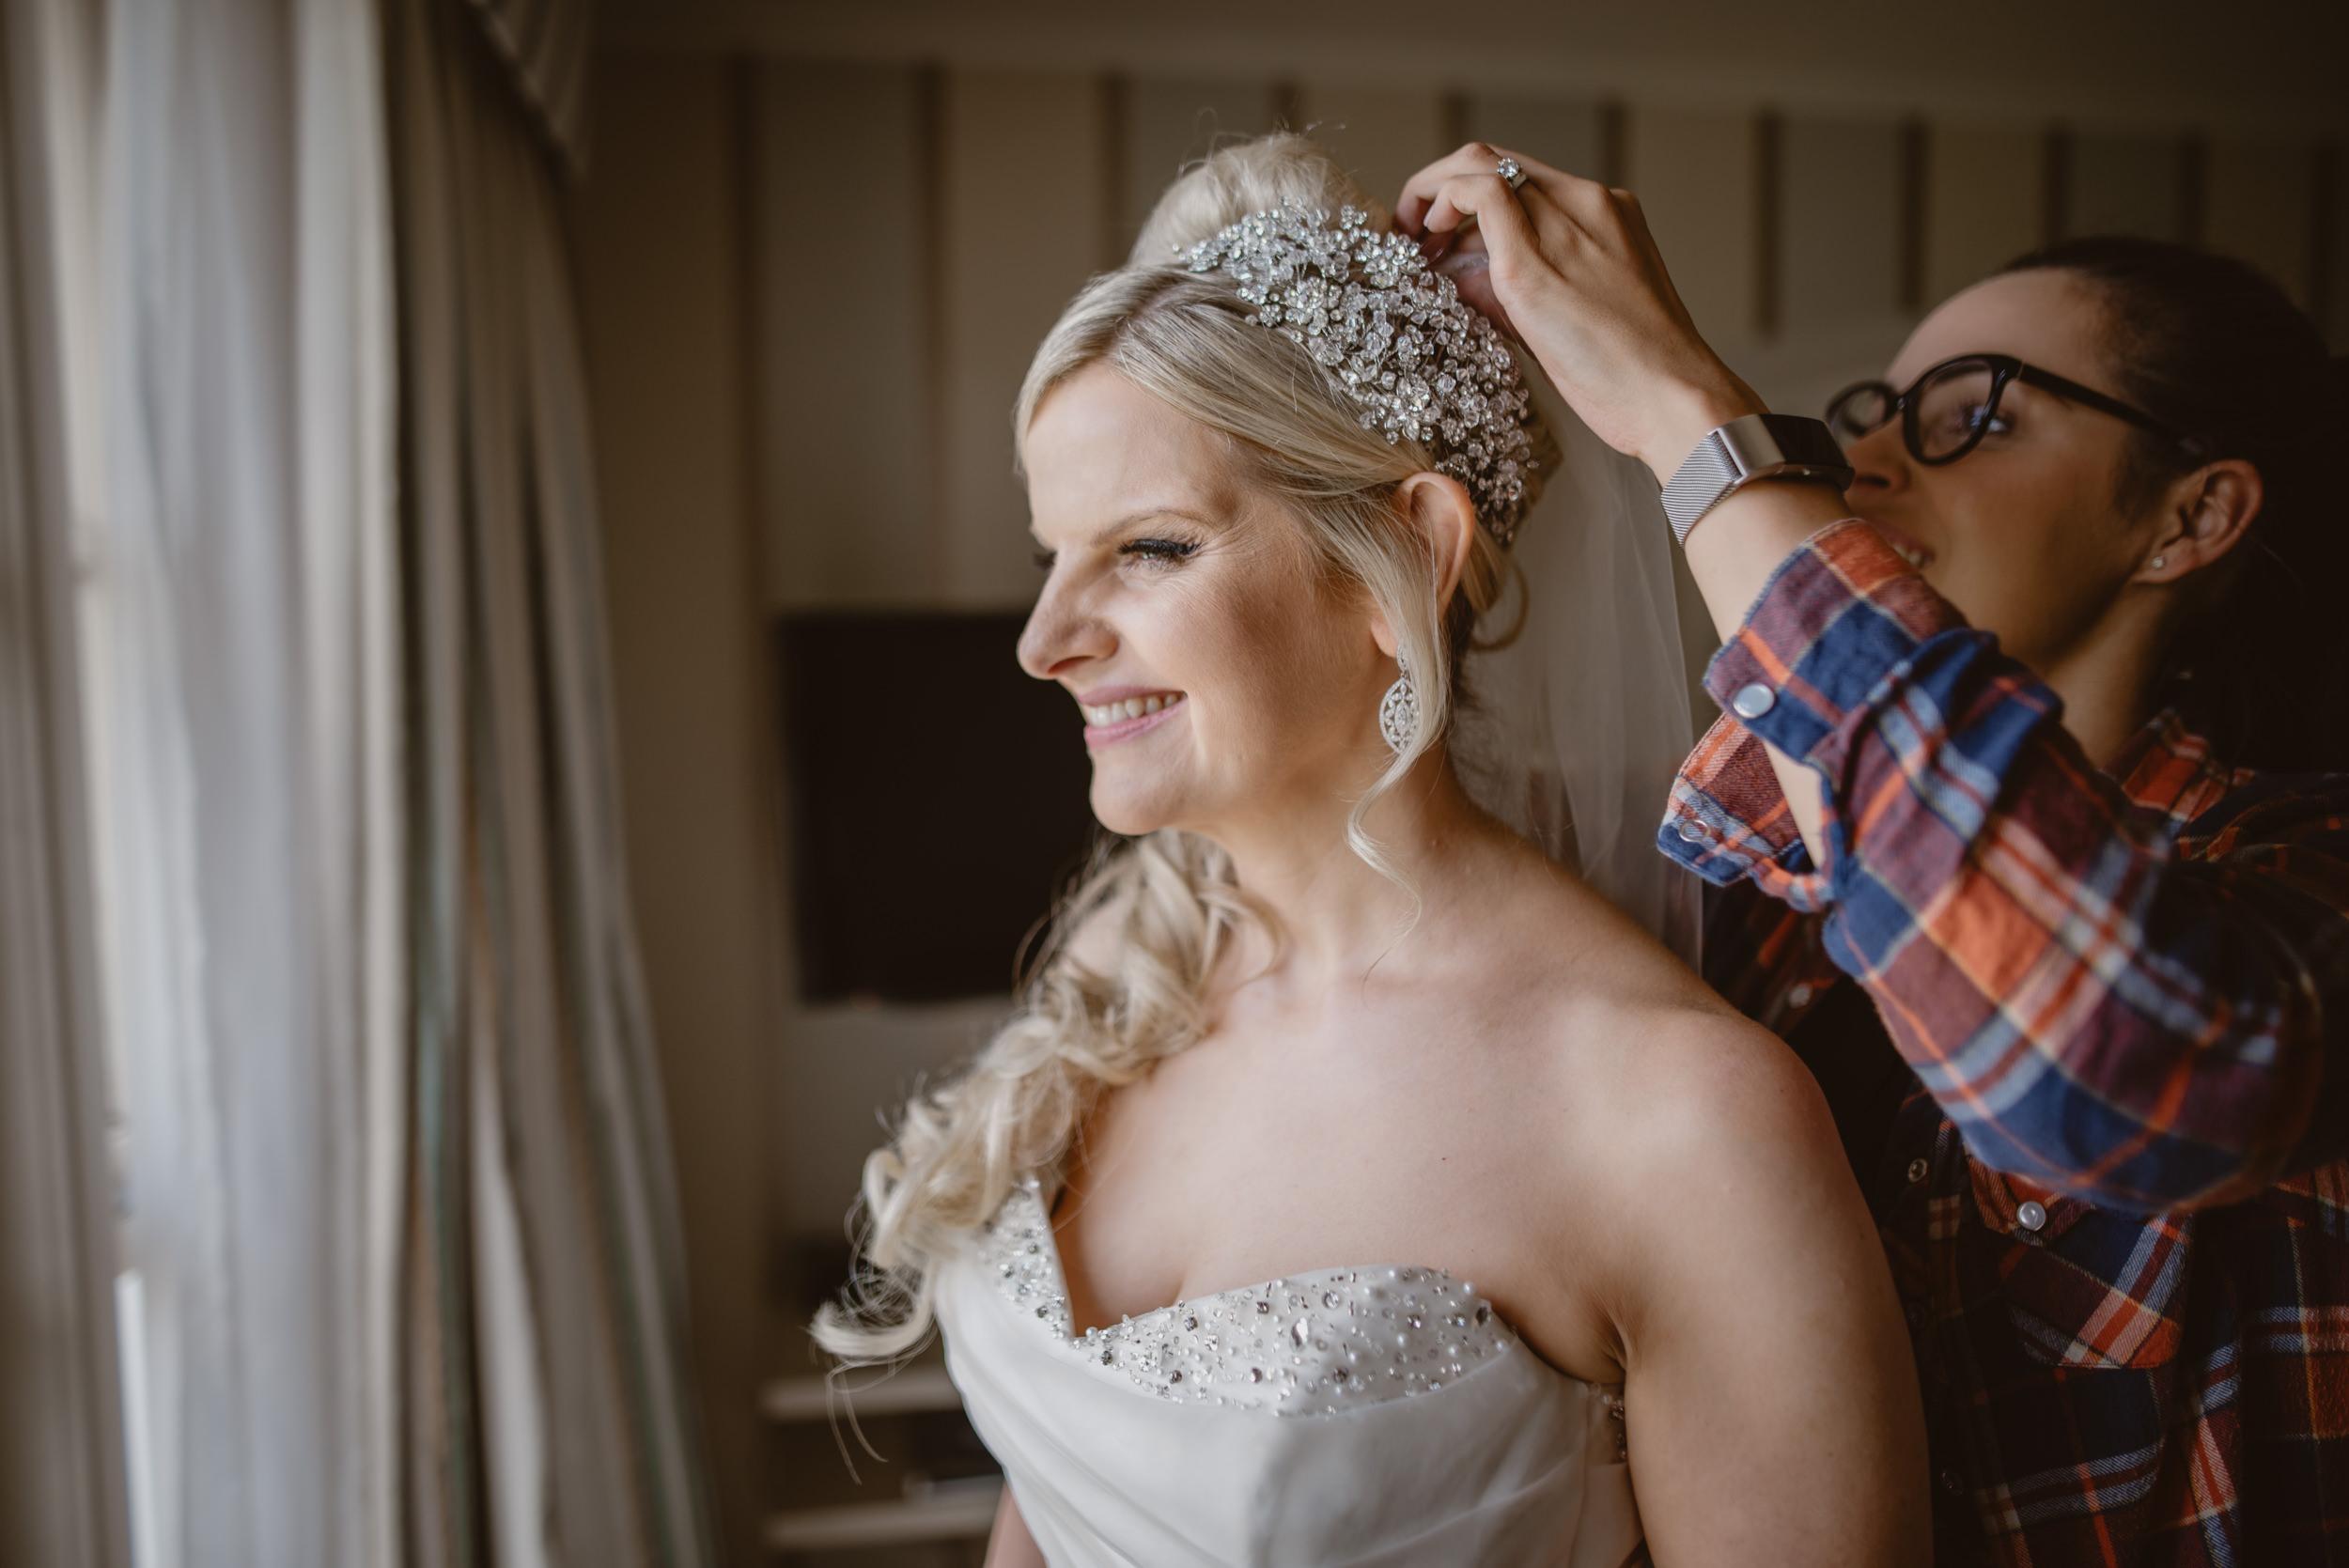 Trisha-and-Roger-wedding-The-Priory-Church-and-Chewton-Glen-Hotel-Christchurch-Manu-Mendoza-Wedding-Photography-074.jpg